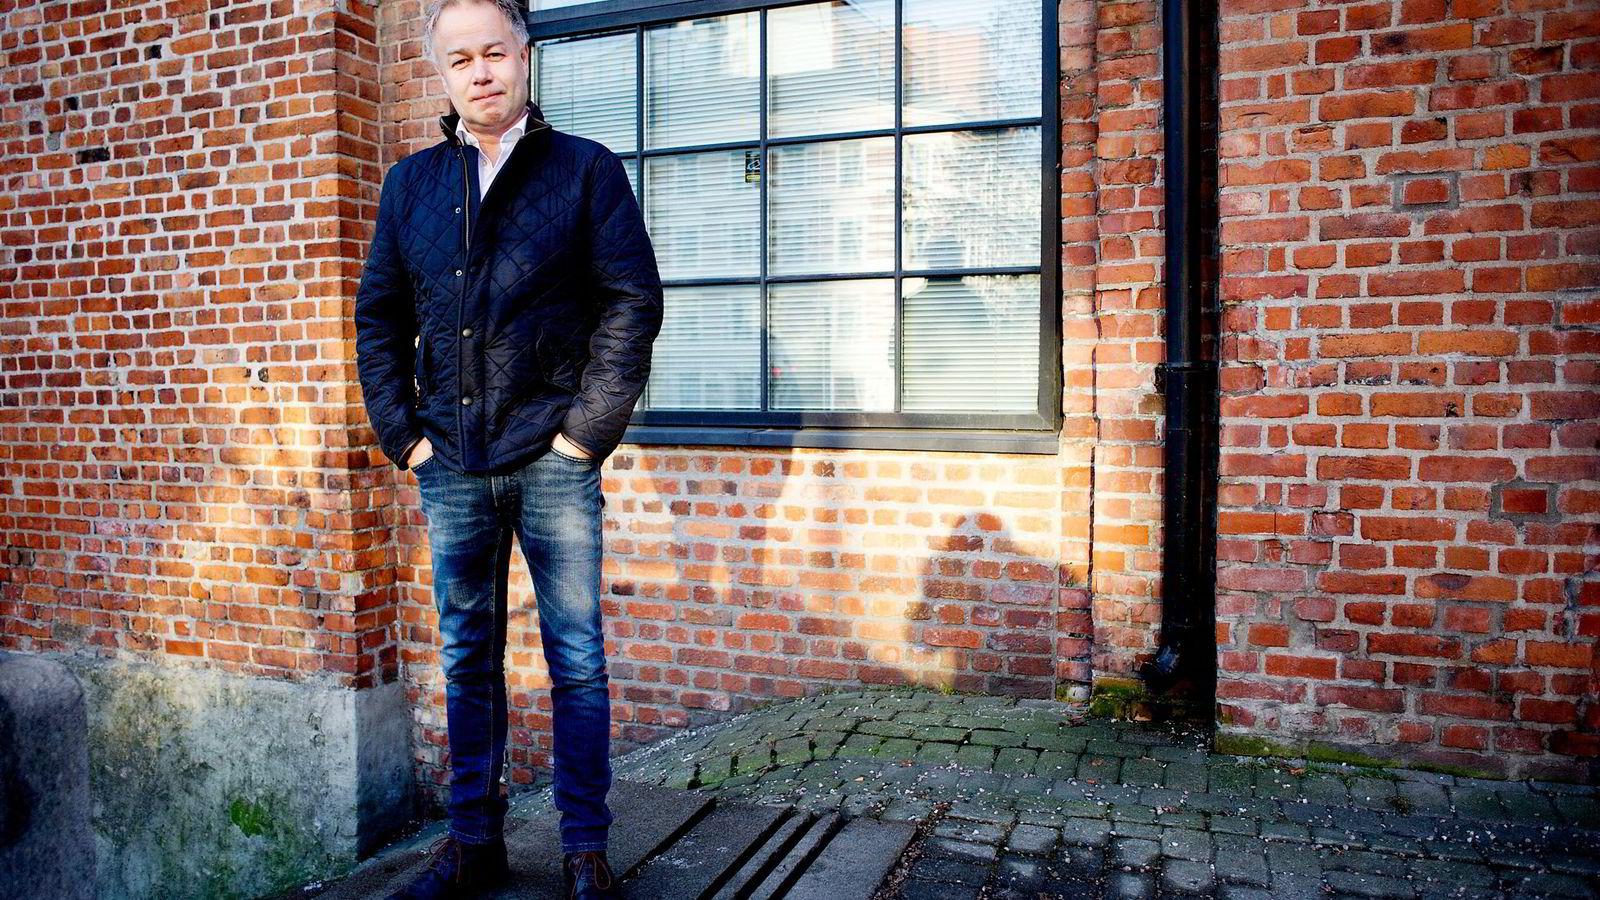 06.02 2015 Oslo Redaktør Bård Espen hansen i TV2.no har kraftig vekst på mobil. .